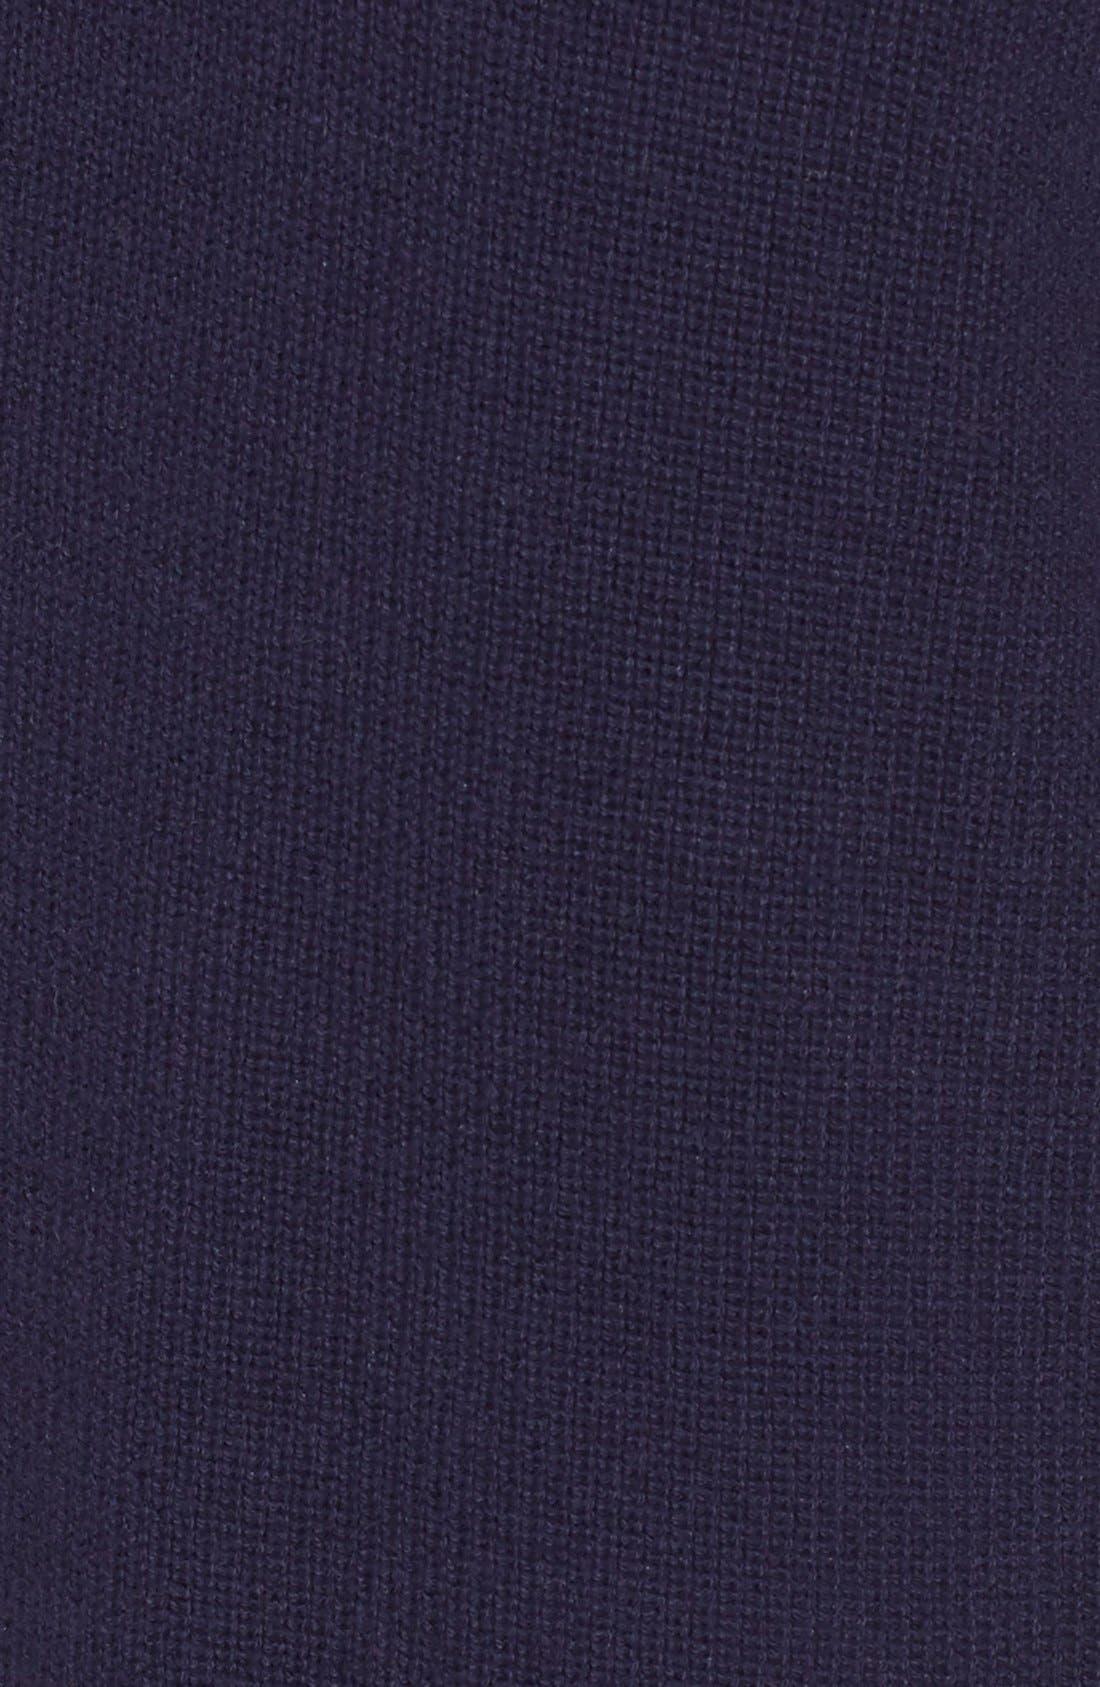 Mock Neck Knit Sweater Dress,                             Alternate thumbnail 5, color,                             Navy Evening